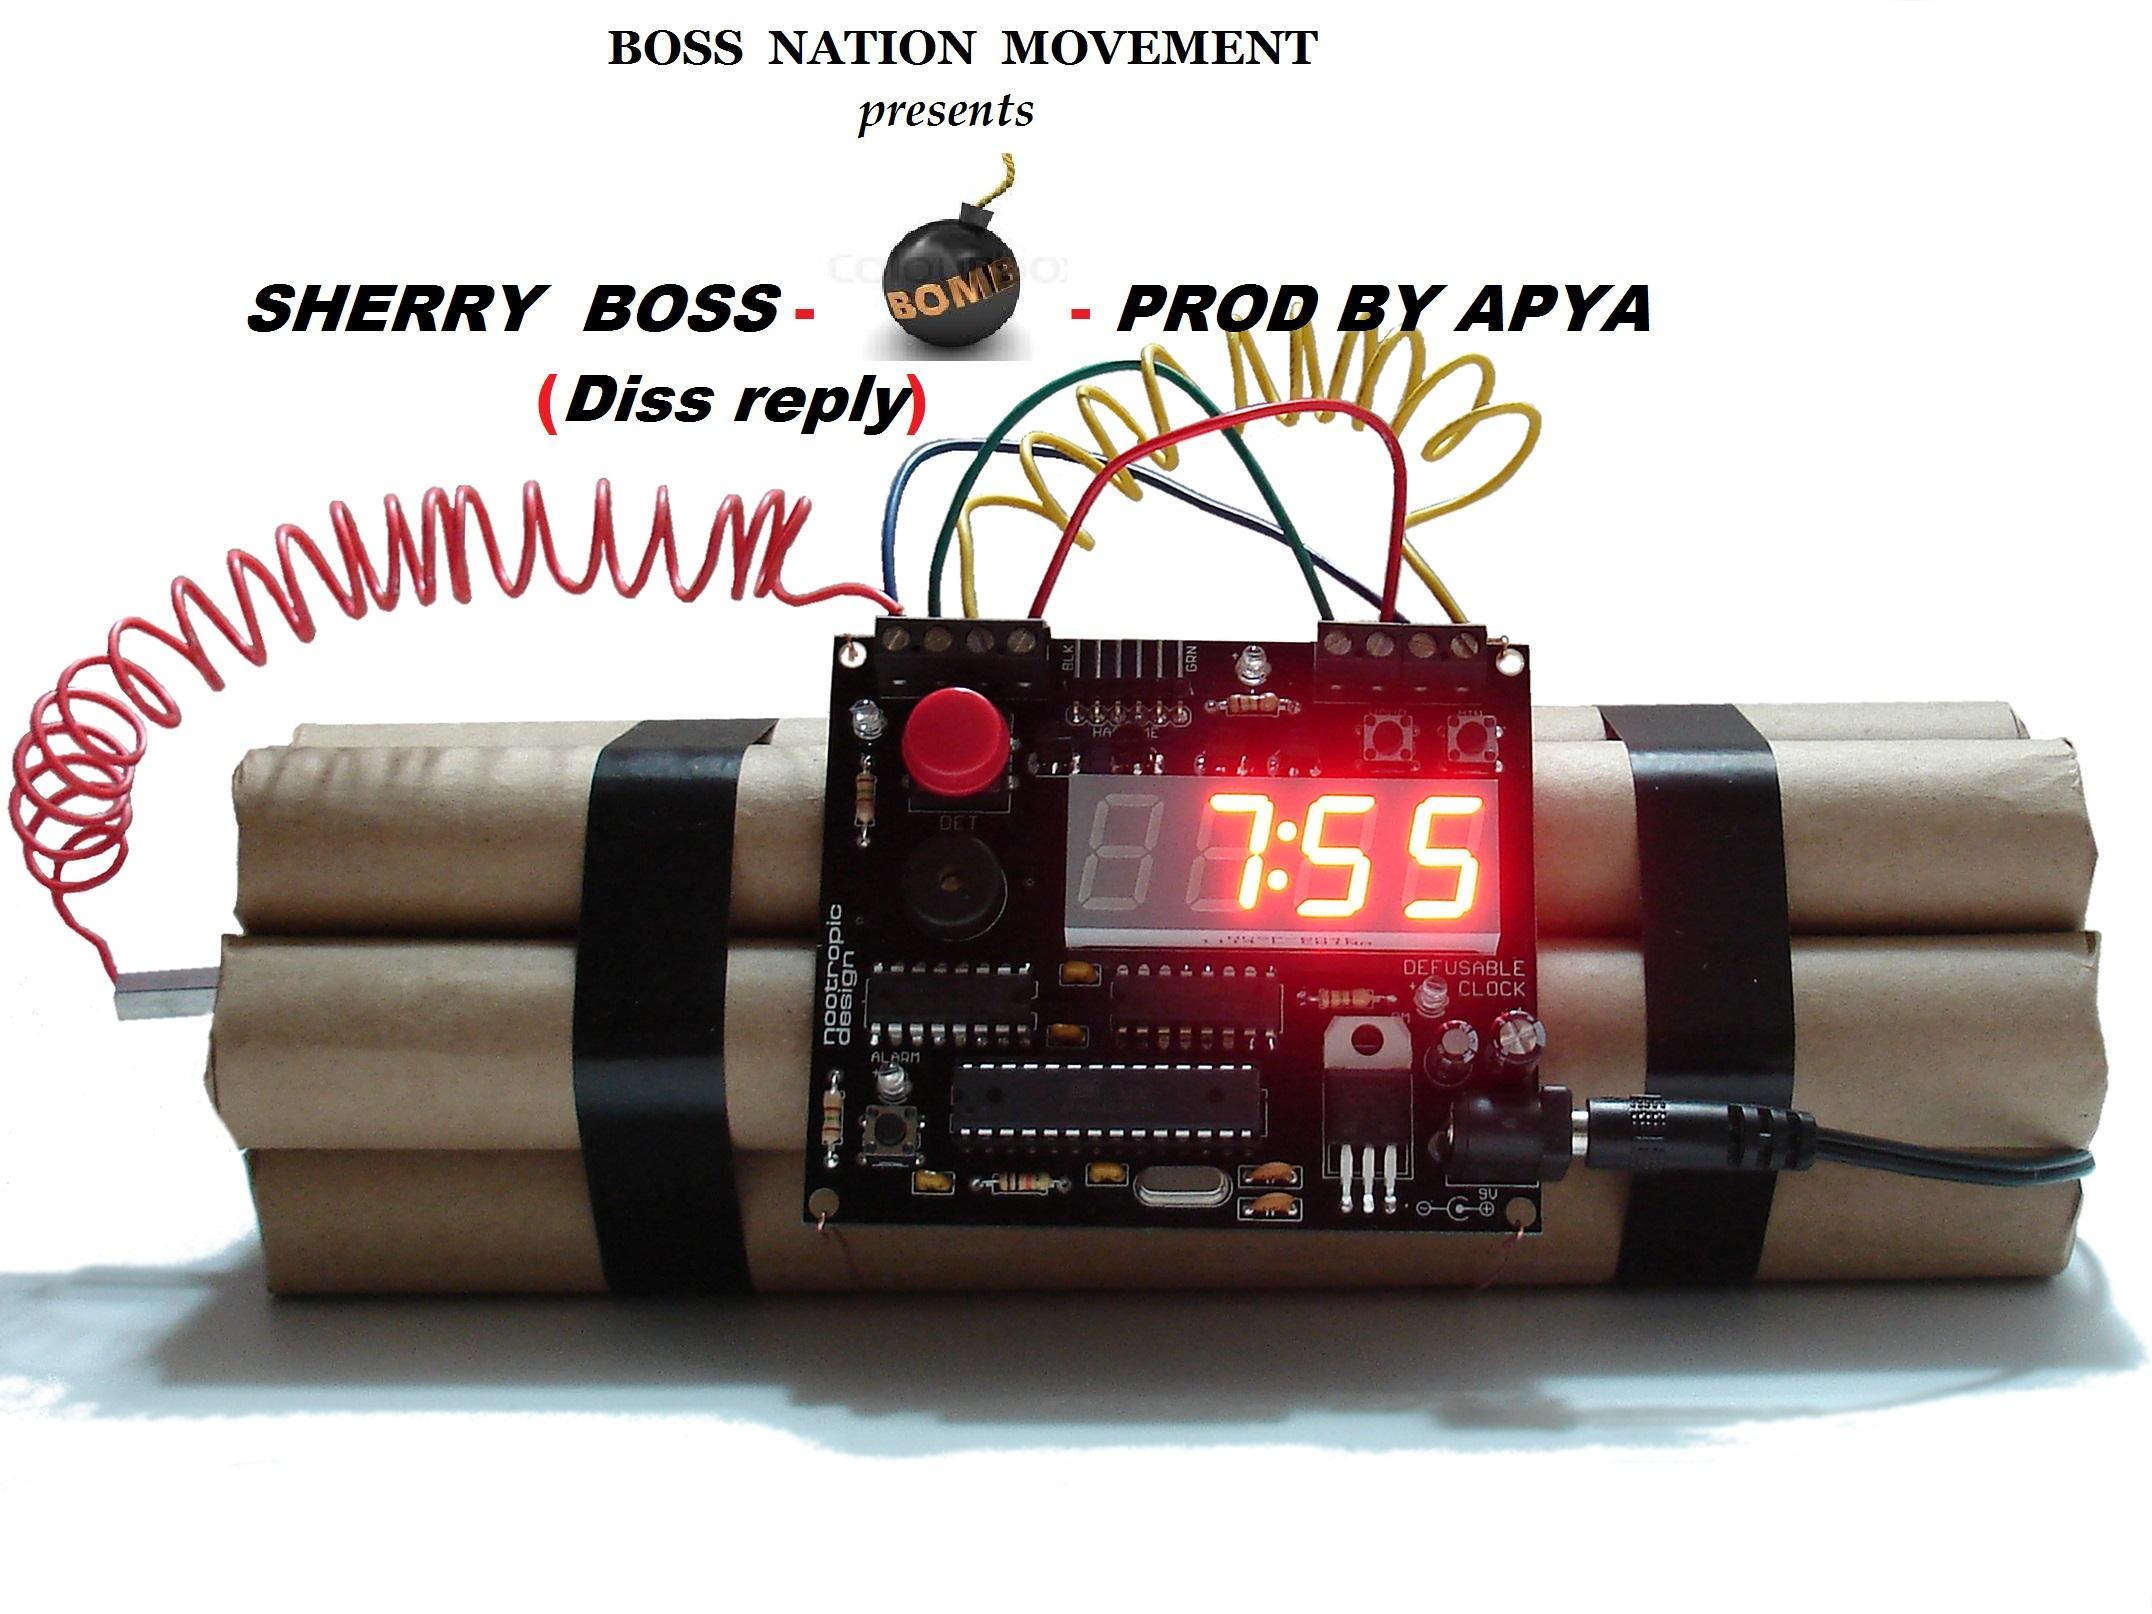 Sherry Boss - Bomb (Prod By Apya) (Nkansah Liwin Diss)